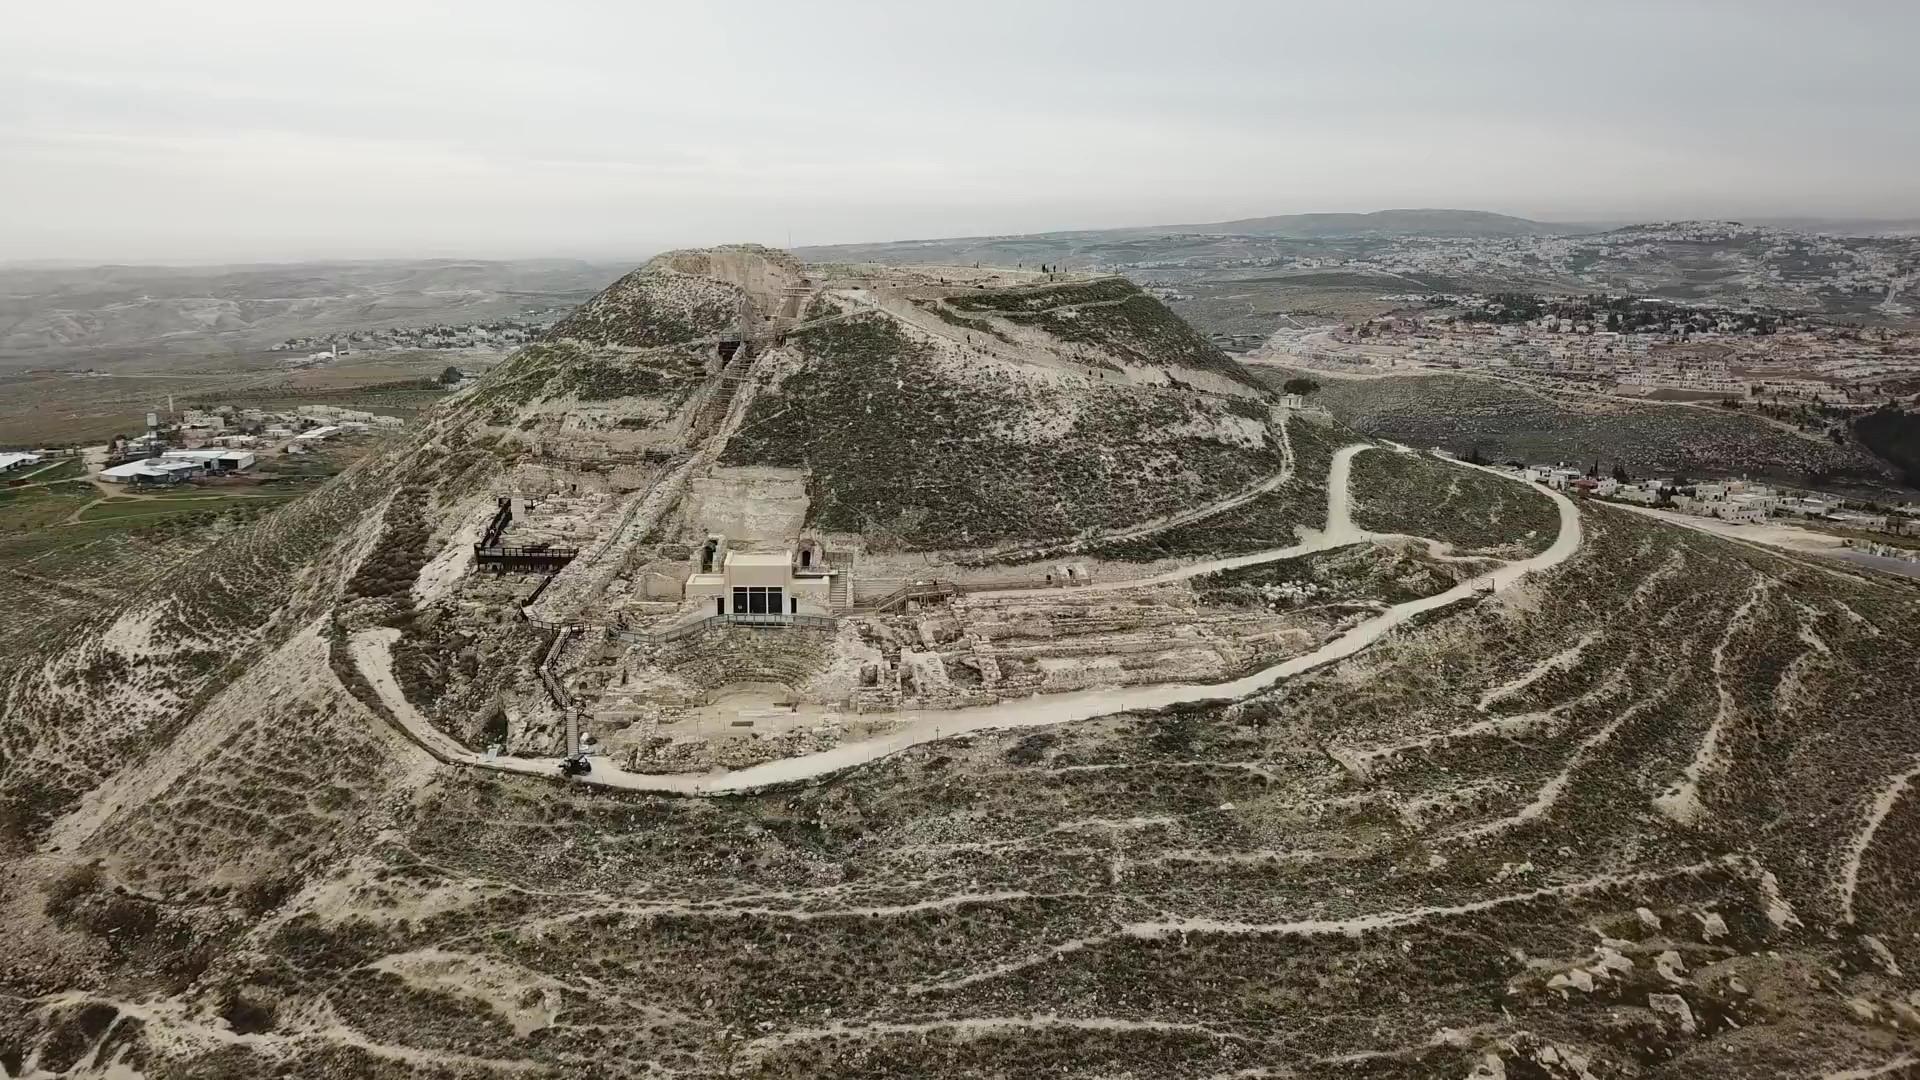 Herodion Aerial Views 1_Moment5.jpg